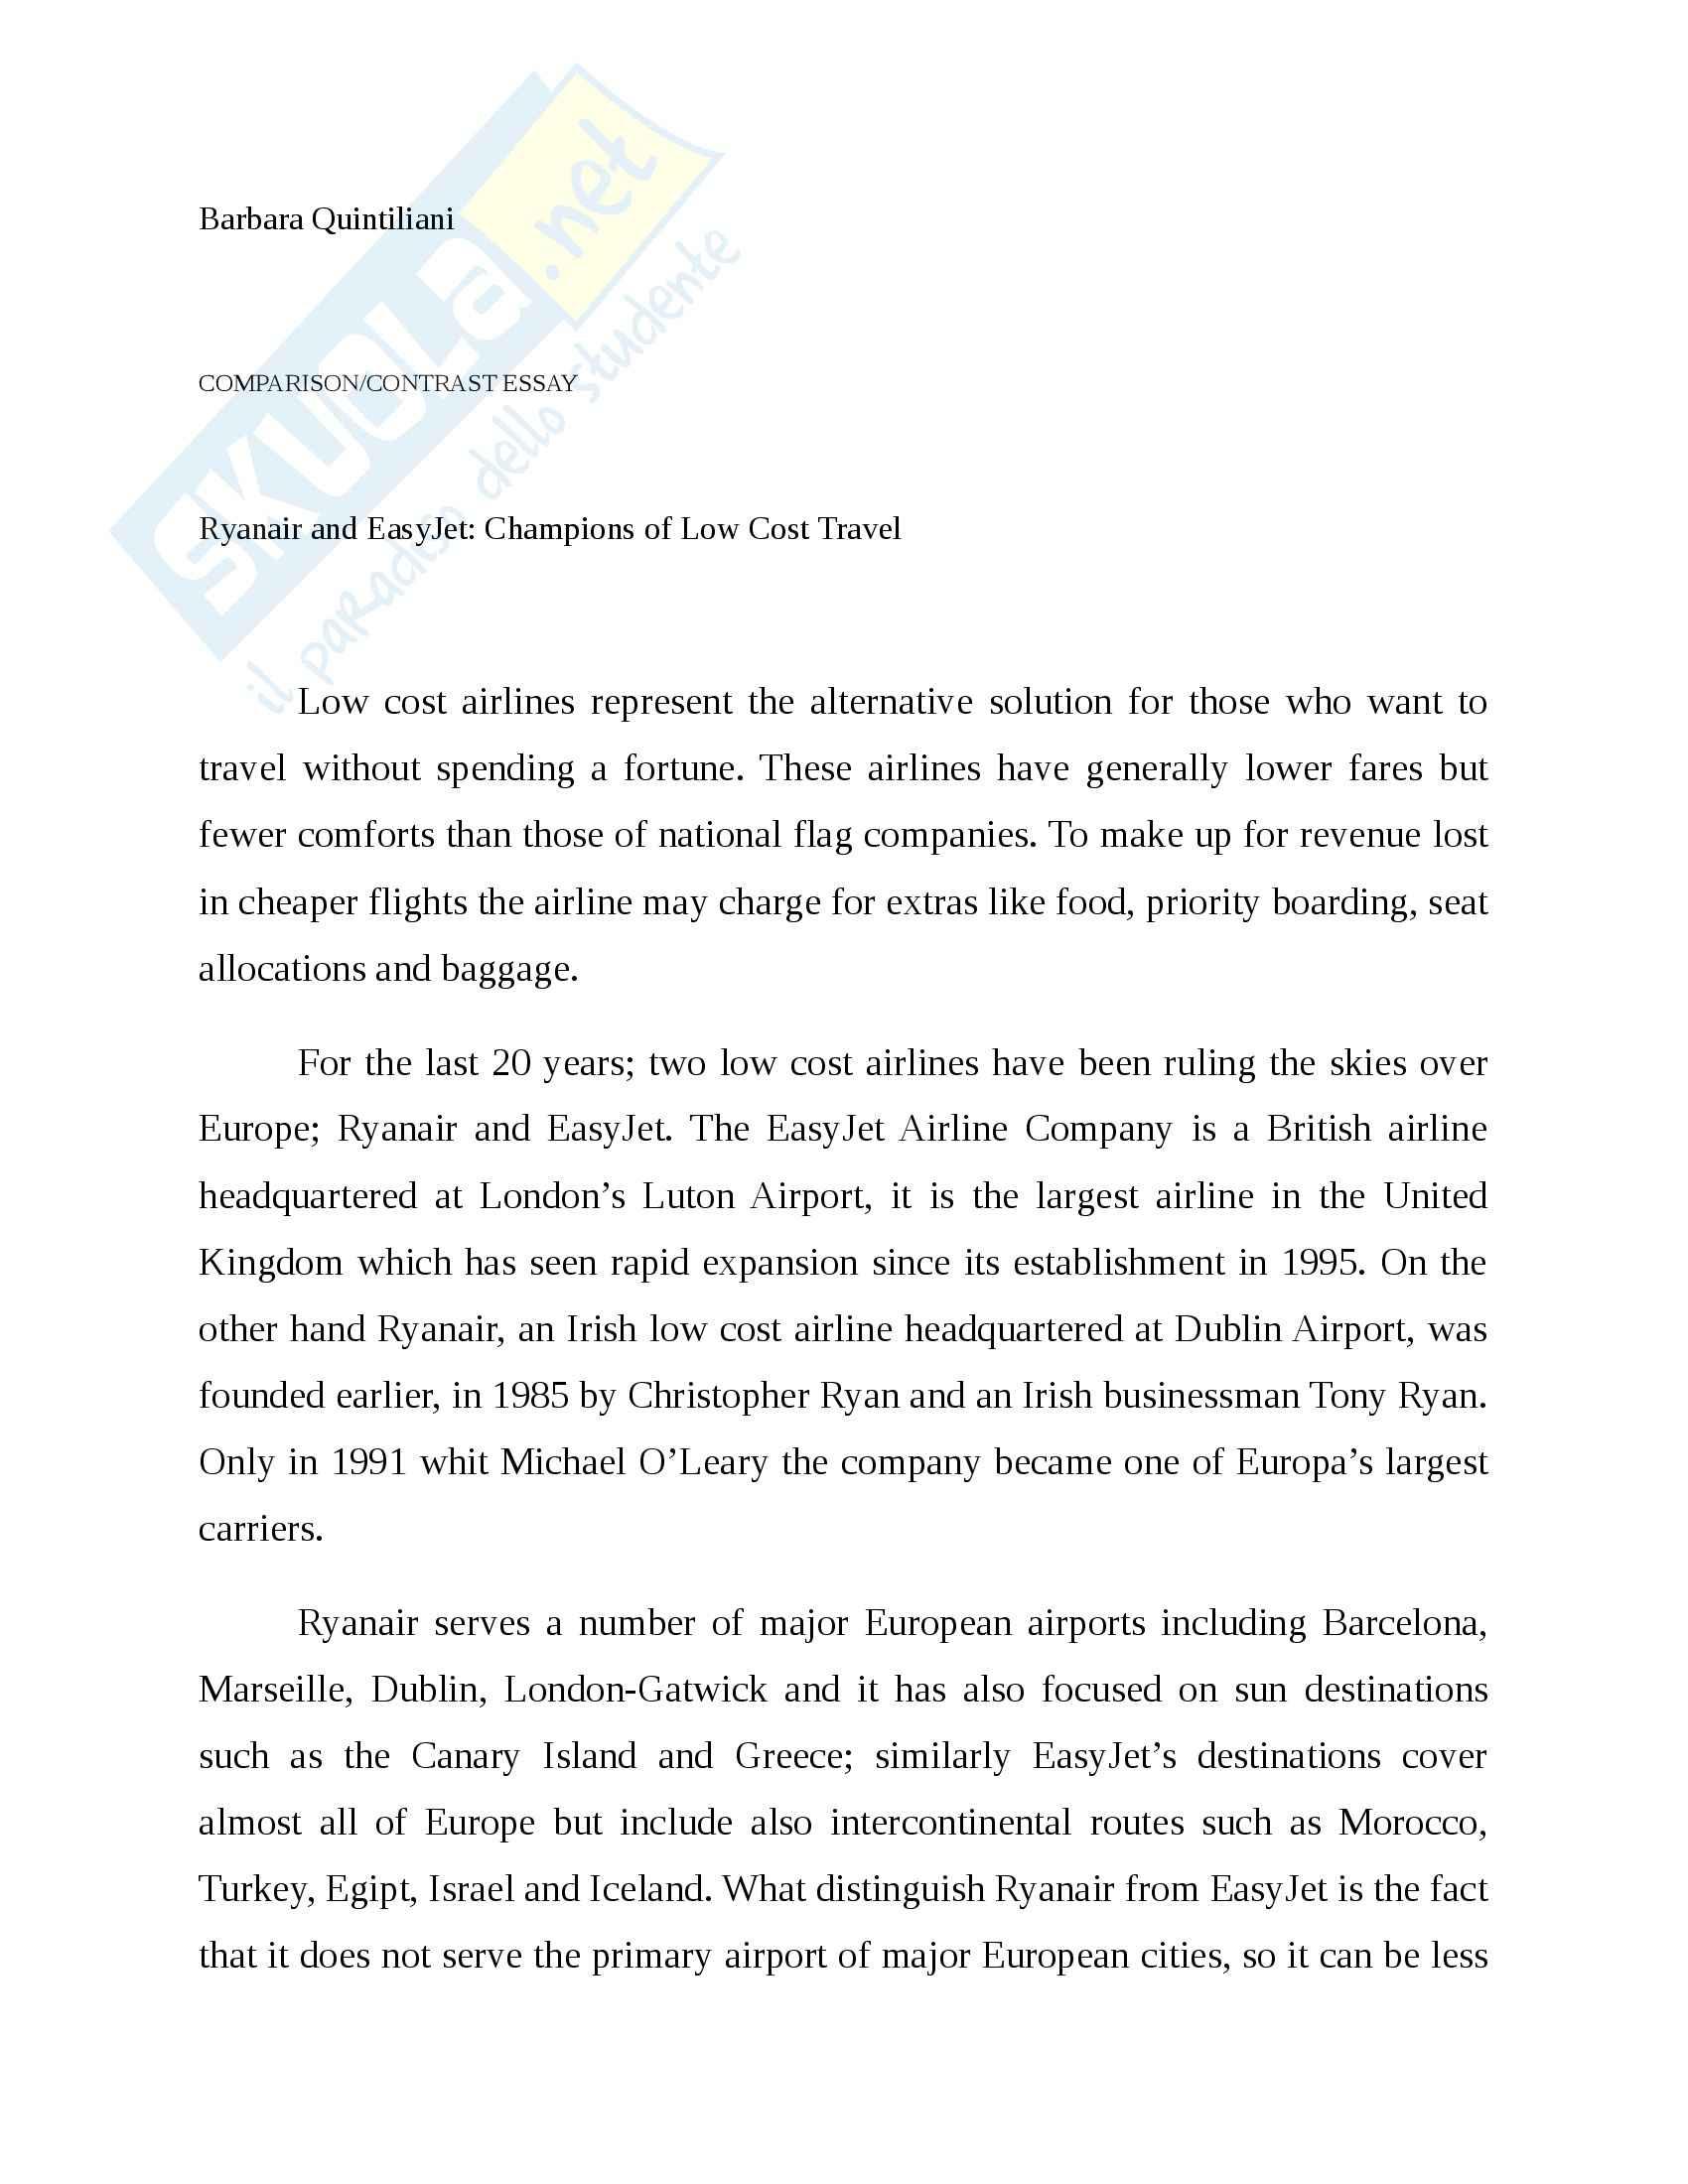 Ryanair and Easyjet Essay, Lingua inglese